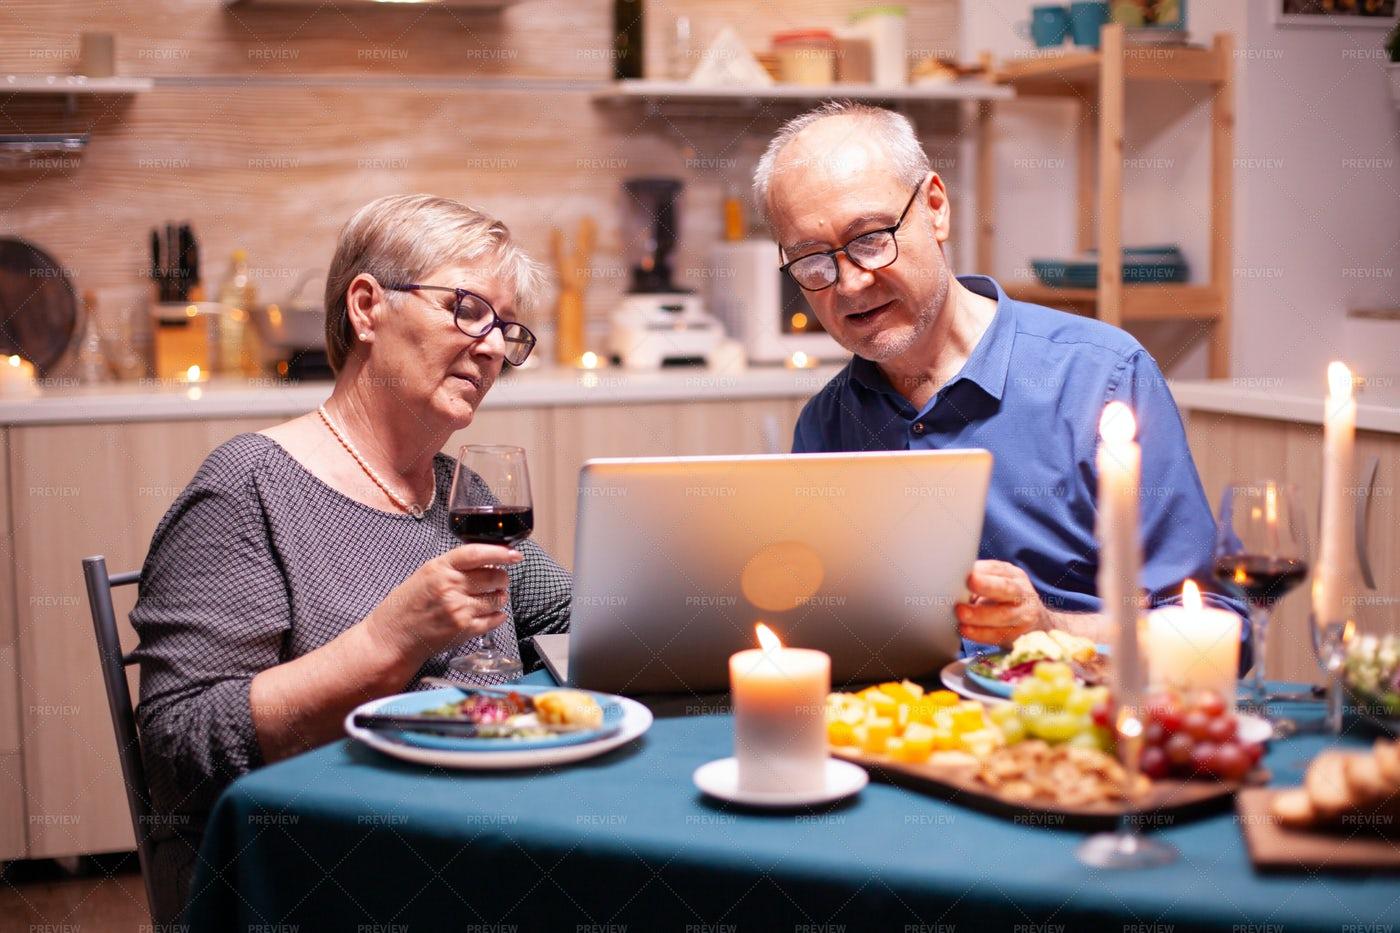 Using A Laptop At Dinner: Stock Photos